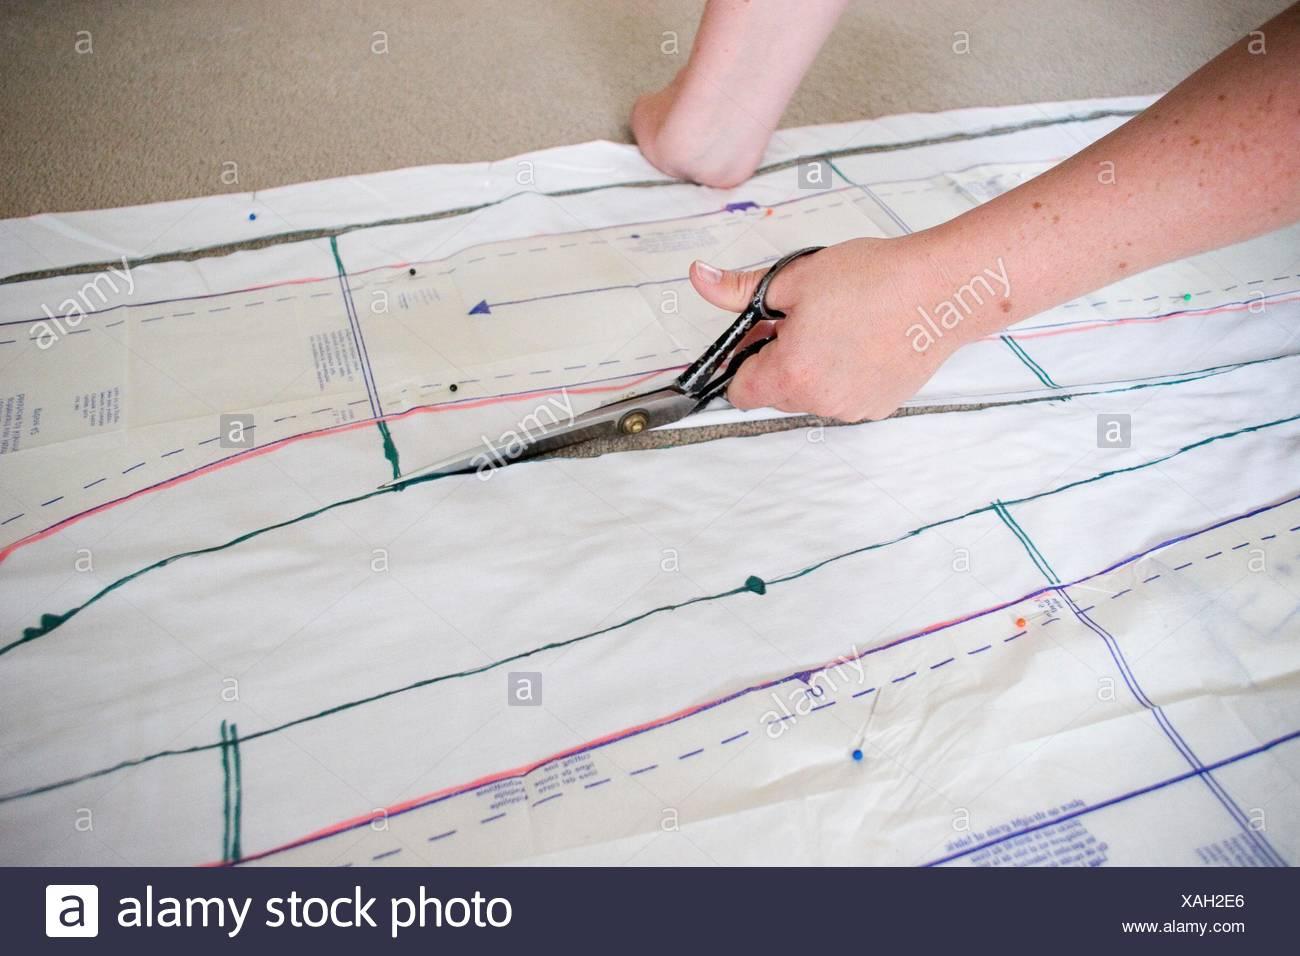 Dressmaking Pattern Stockfotos & Dressmaking Pattern Bilder - Alamy